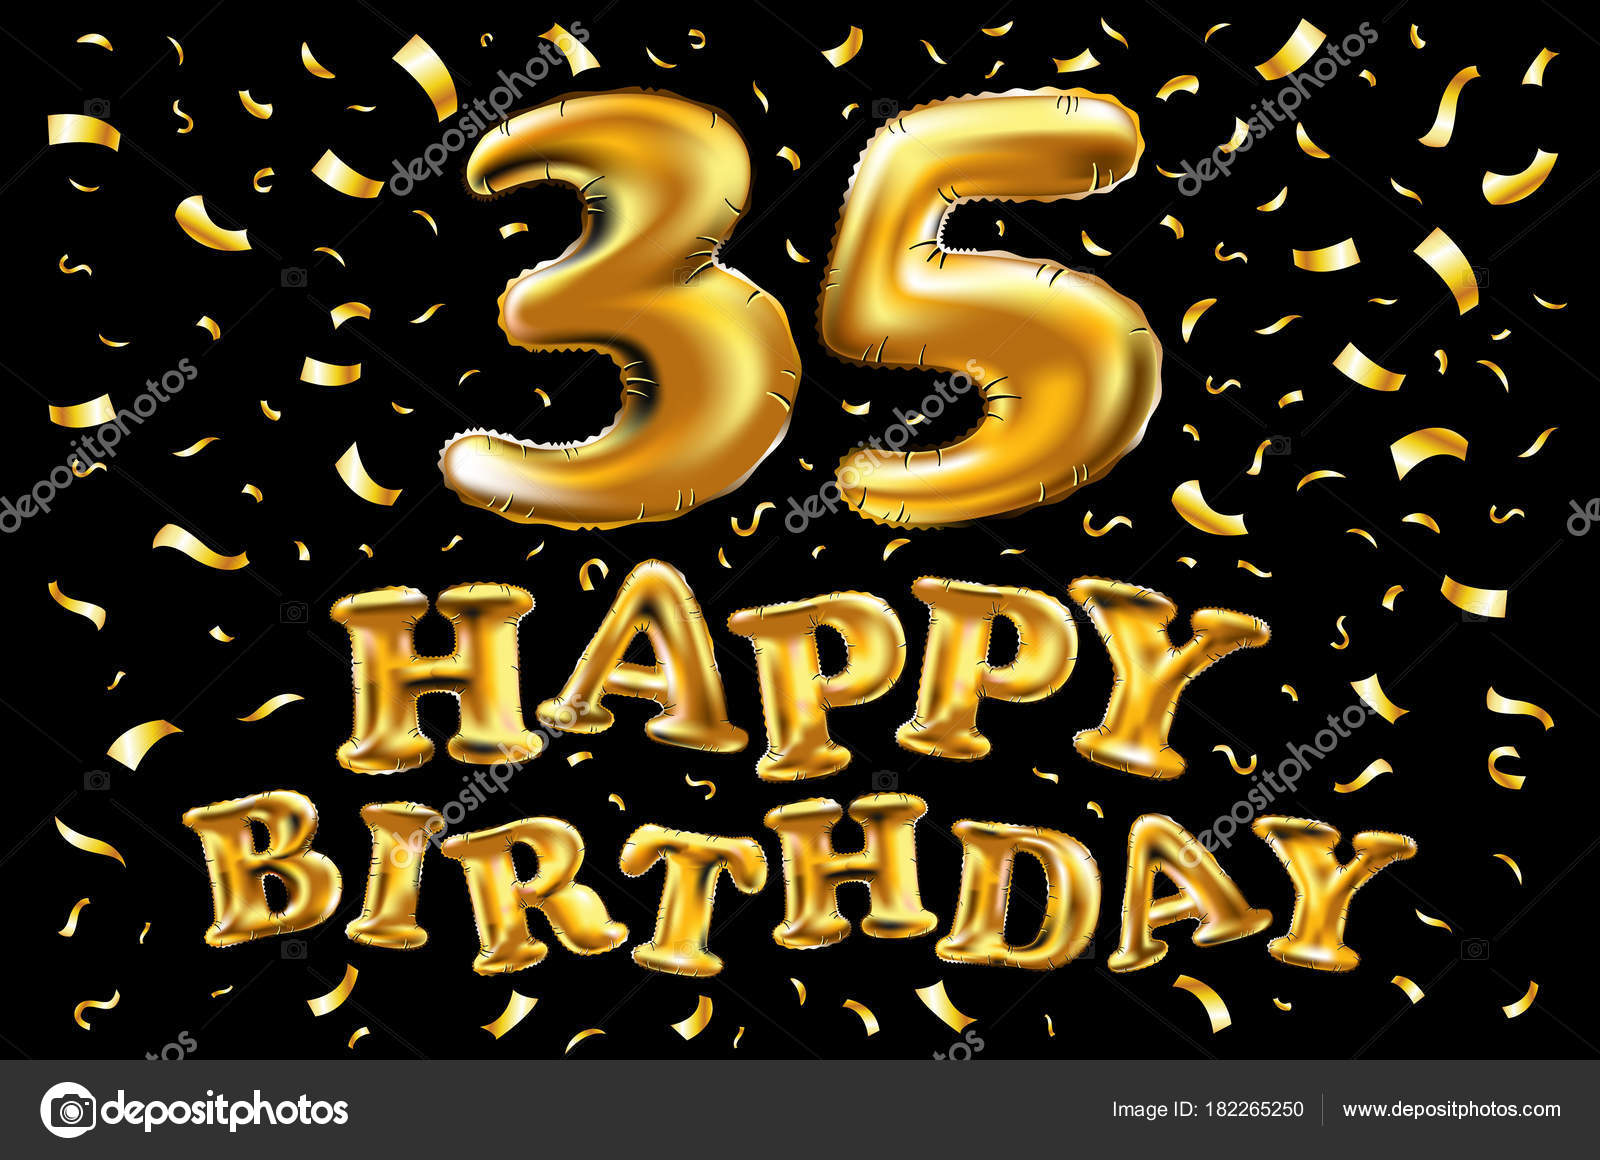 https depositphotos com 182265250 stock illustration 35th birthday celebration with gold html